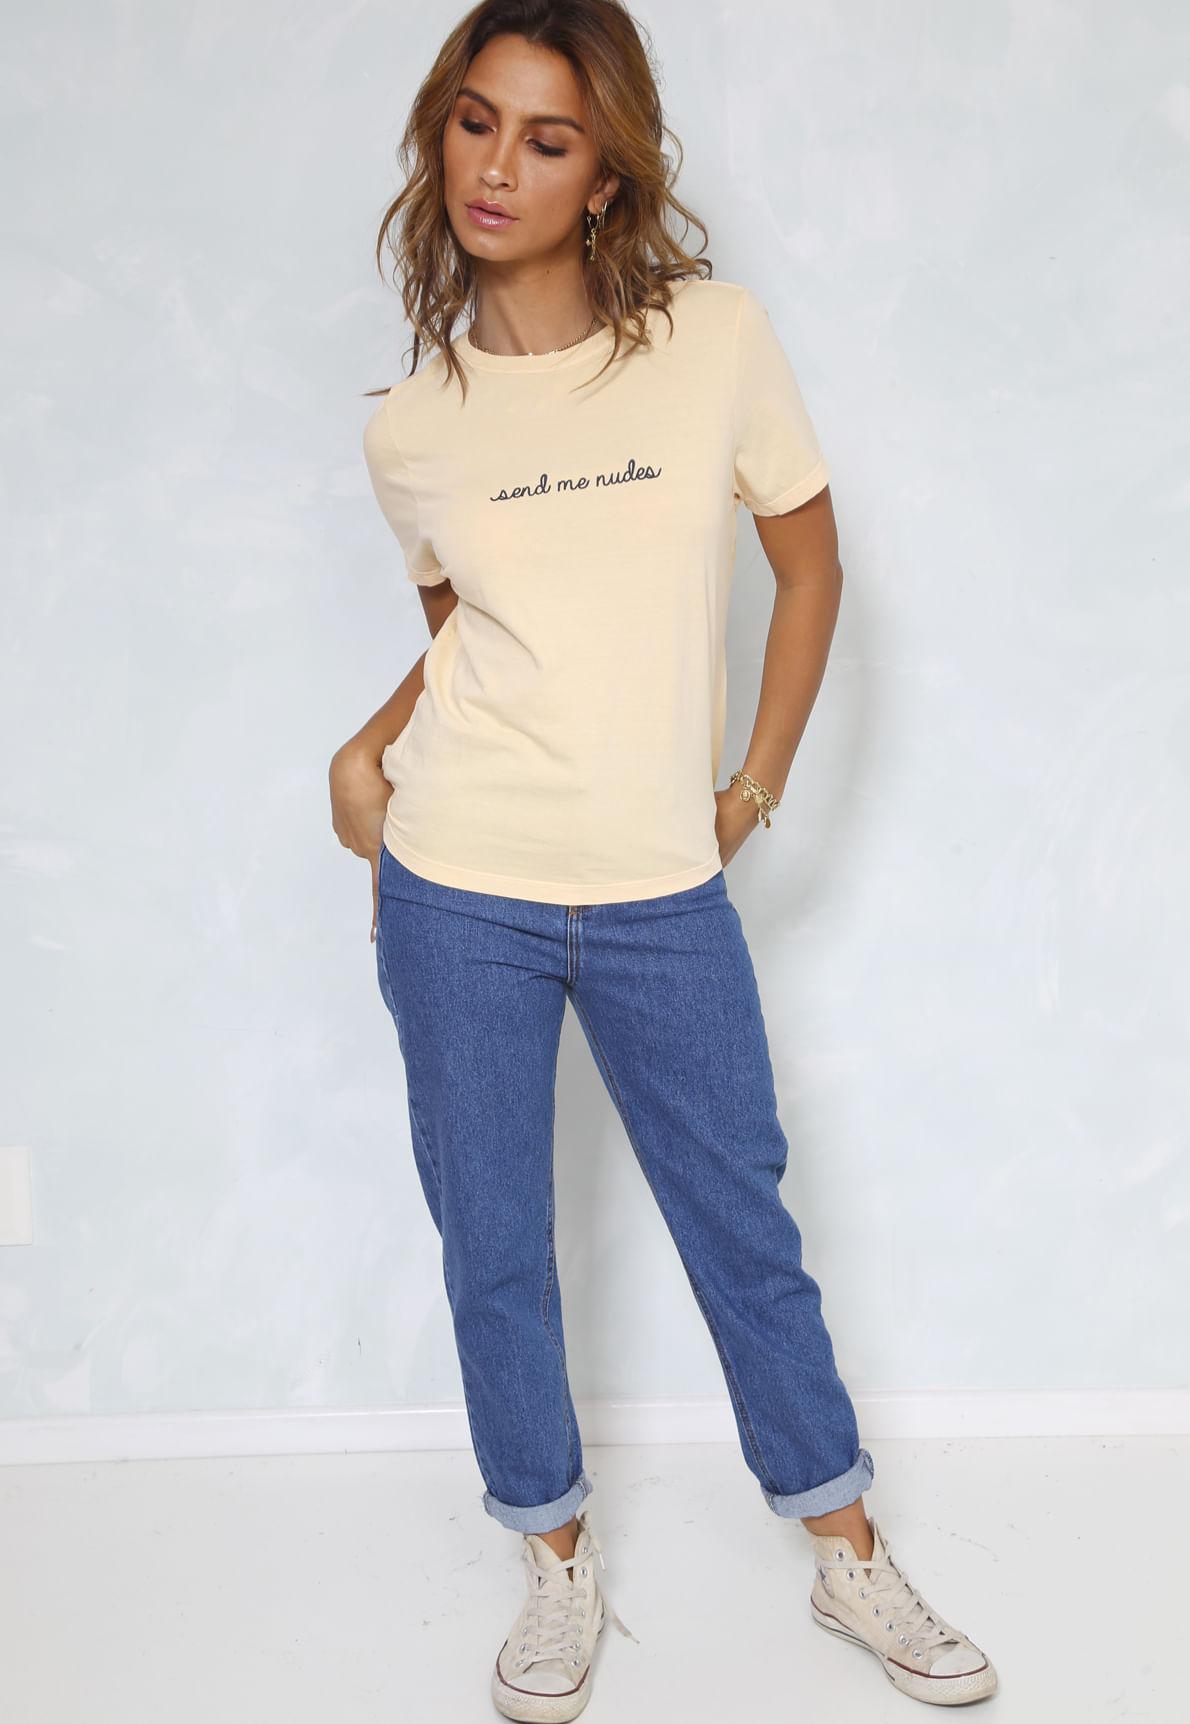 25724-t-shirt-send-me-nudes-mundo-lolita-03